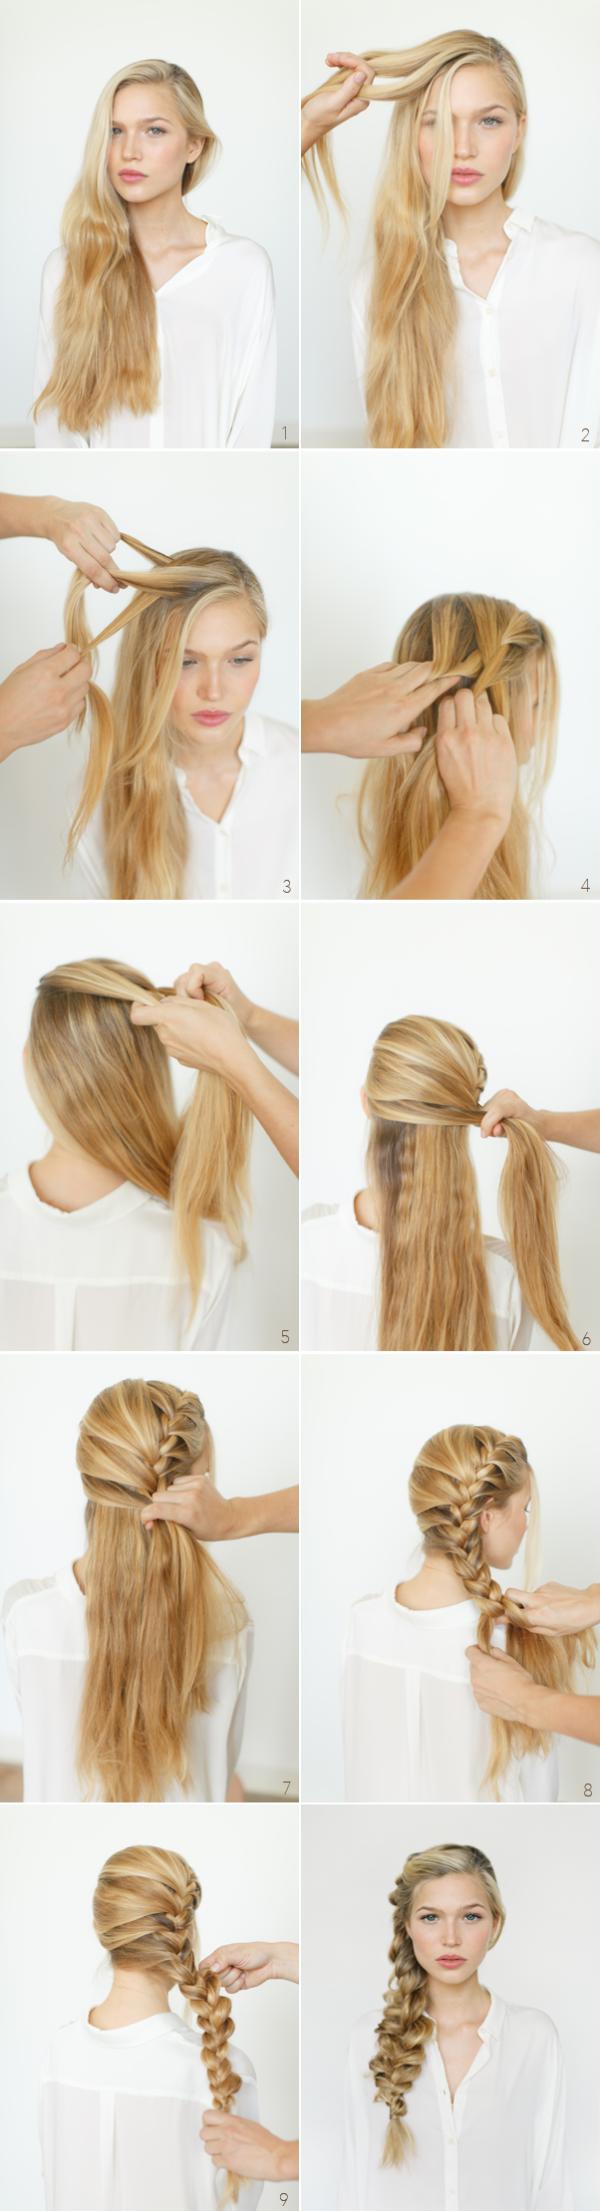 Pin On Hair Style Ucesy